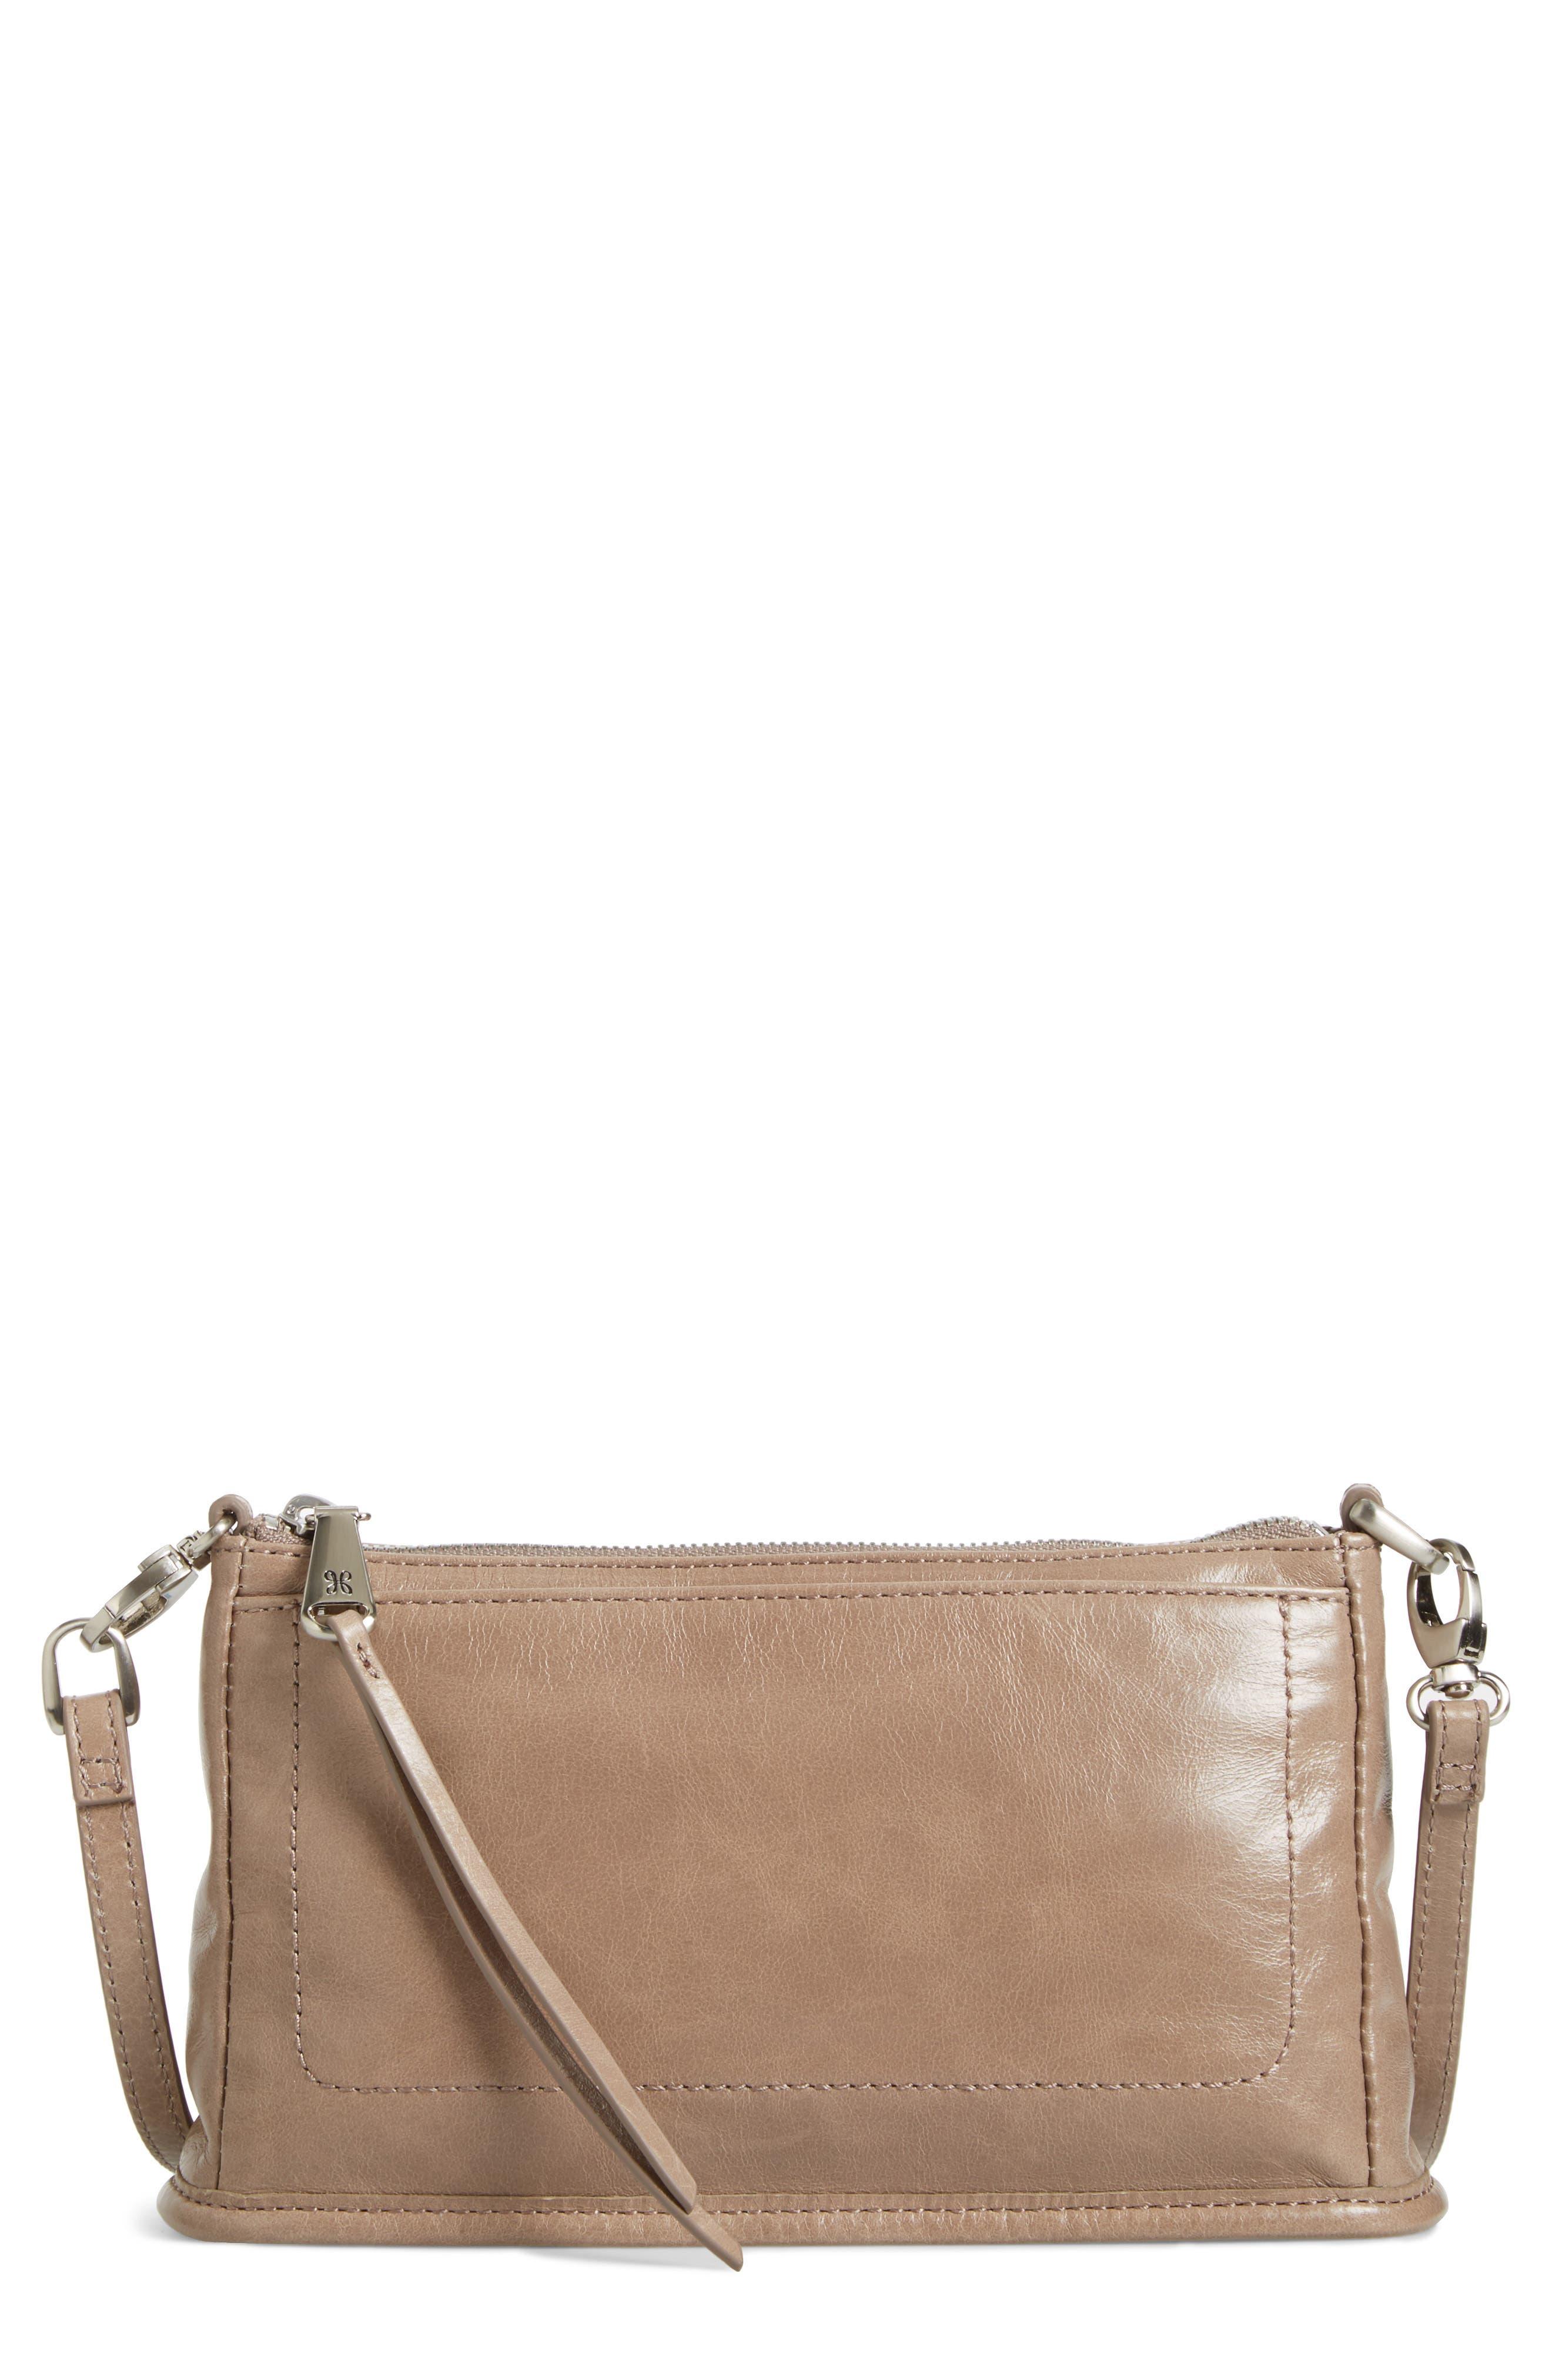 Alternate Image 1 Selected - Hobo 'Small Cadence' Leather Crossbody Bag